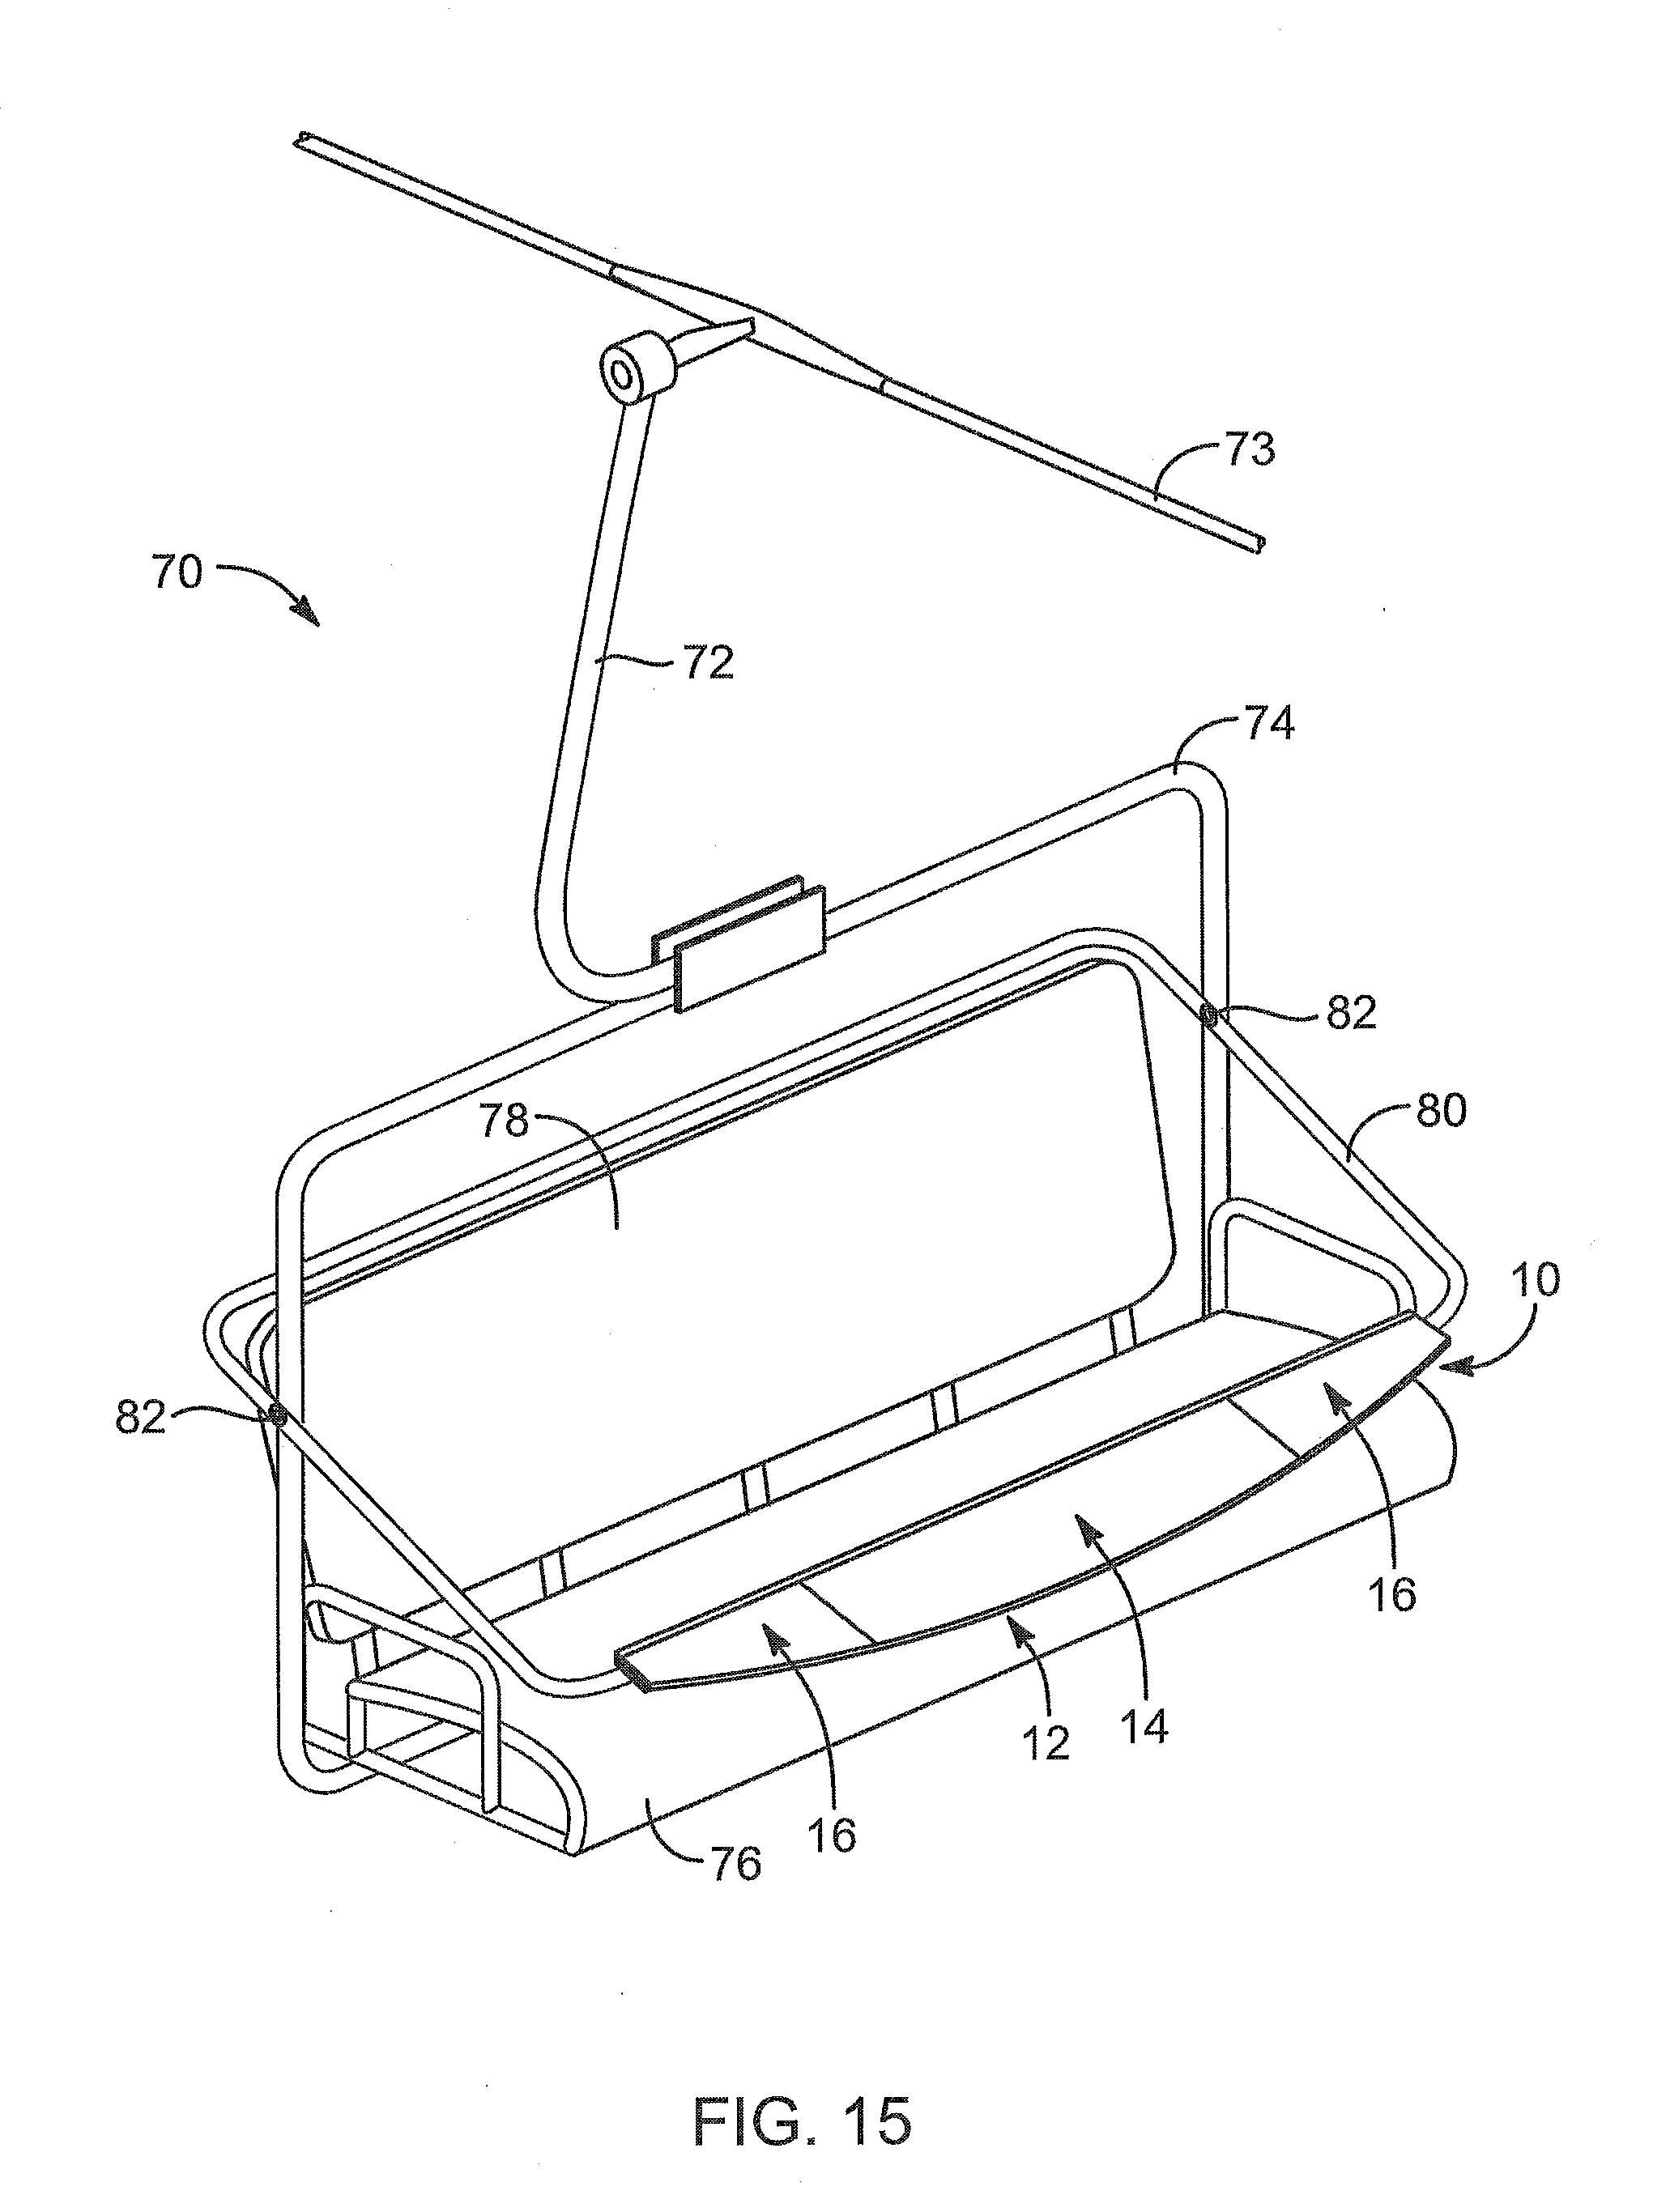 Patent US Ski chair lift display apparatus and method